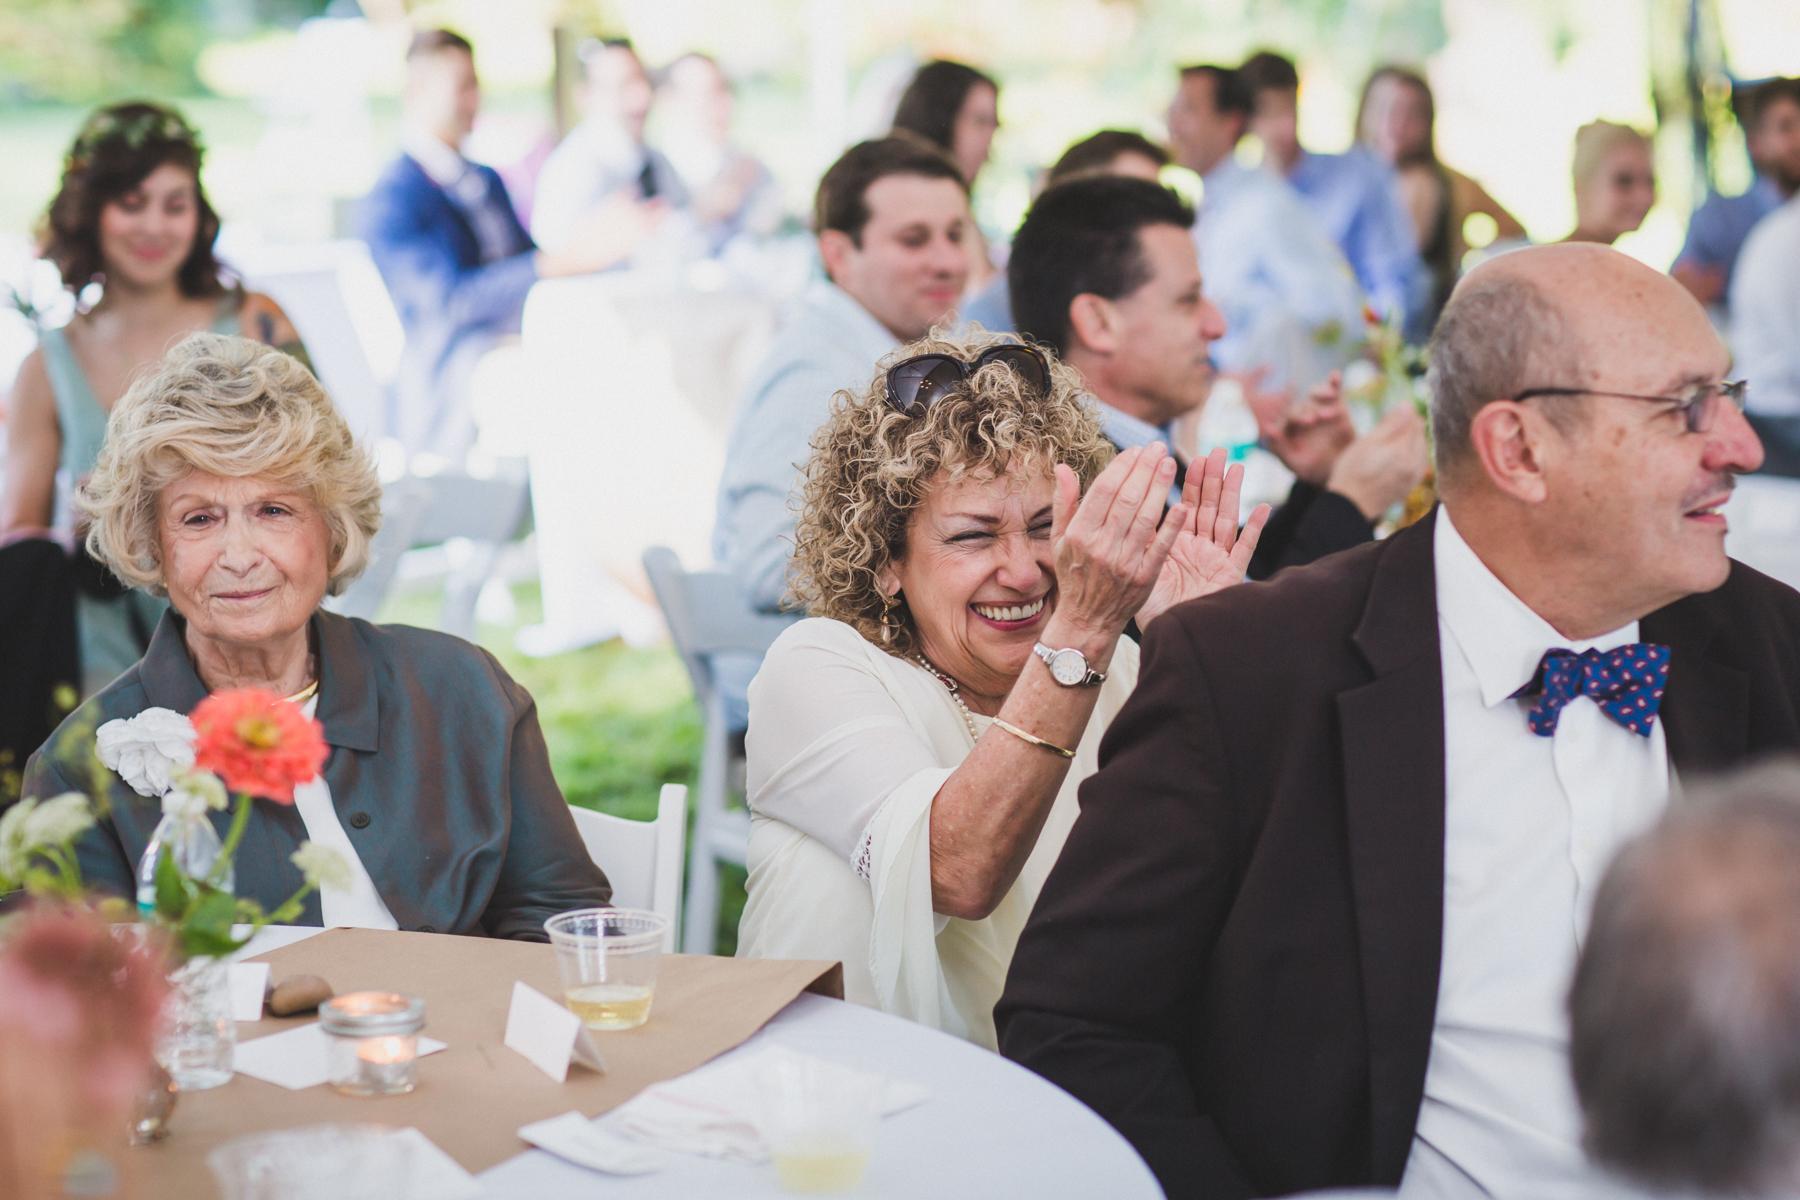 Long-Island-Documentary-Wedding-Photography-Summer-Tent-Wedding-in-New-York-115.jpg